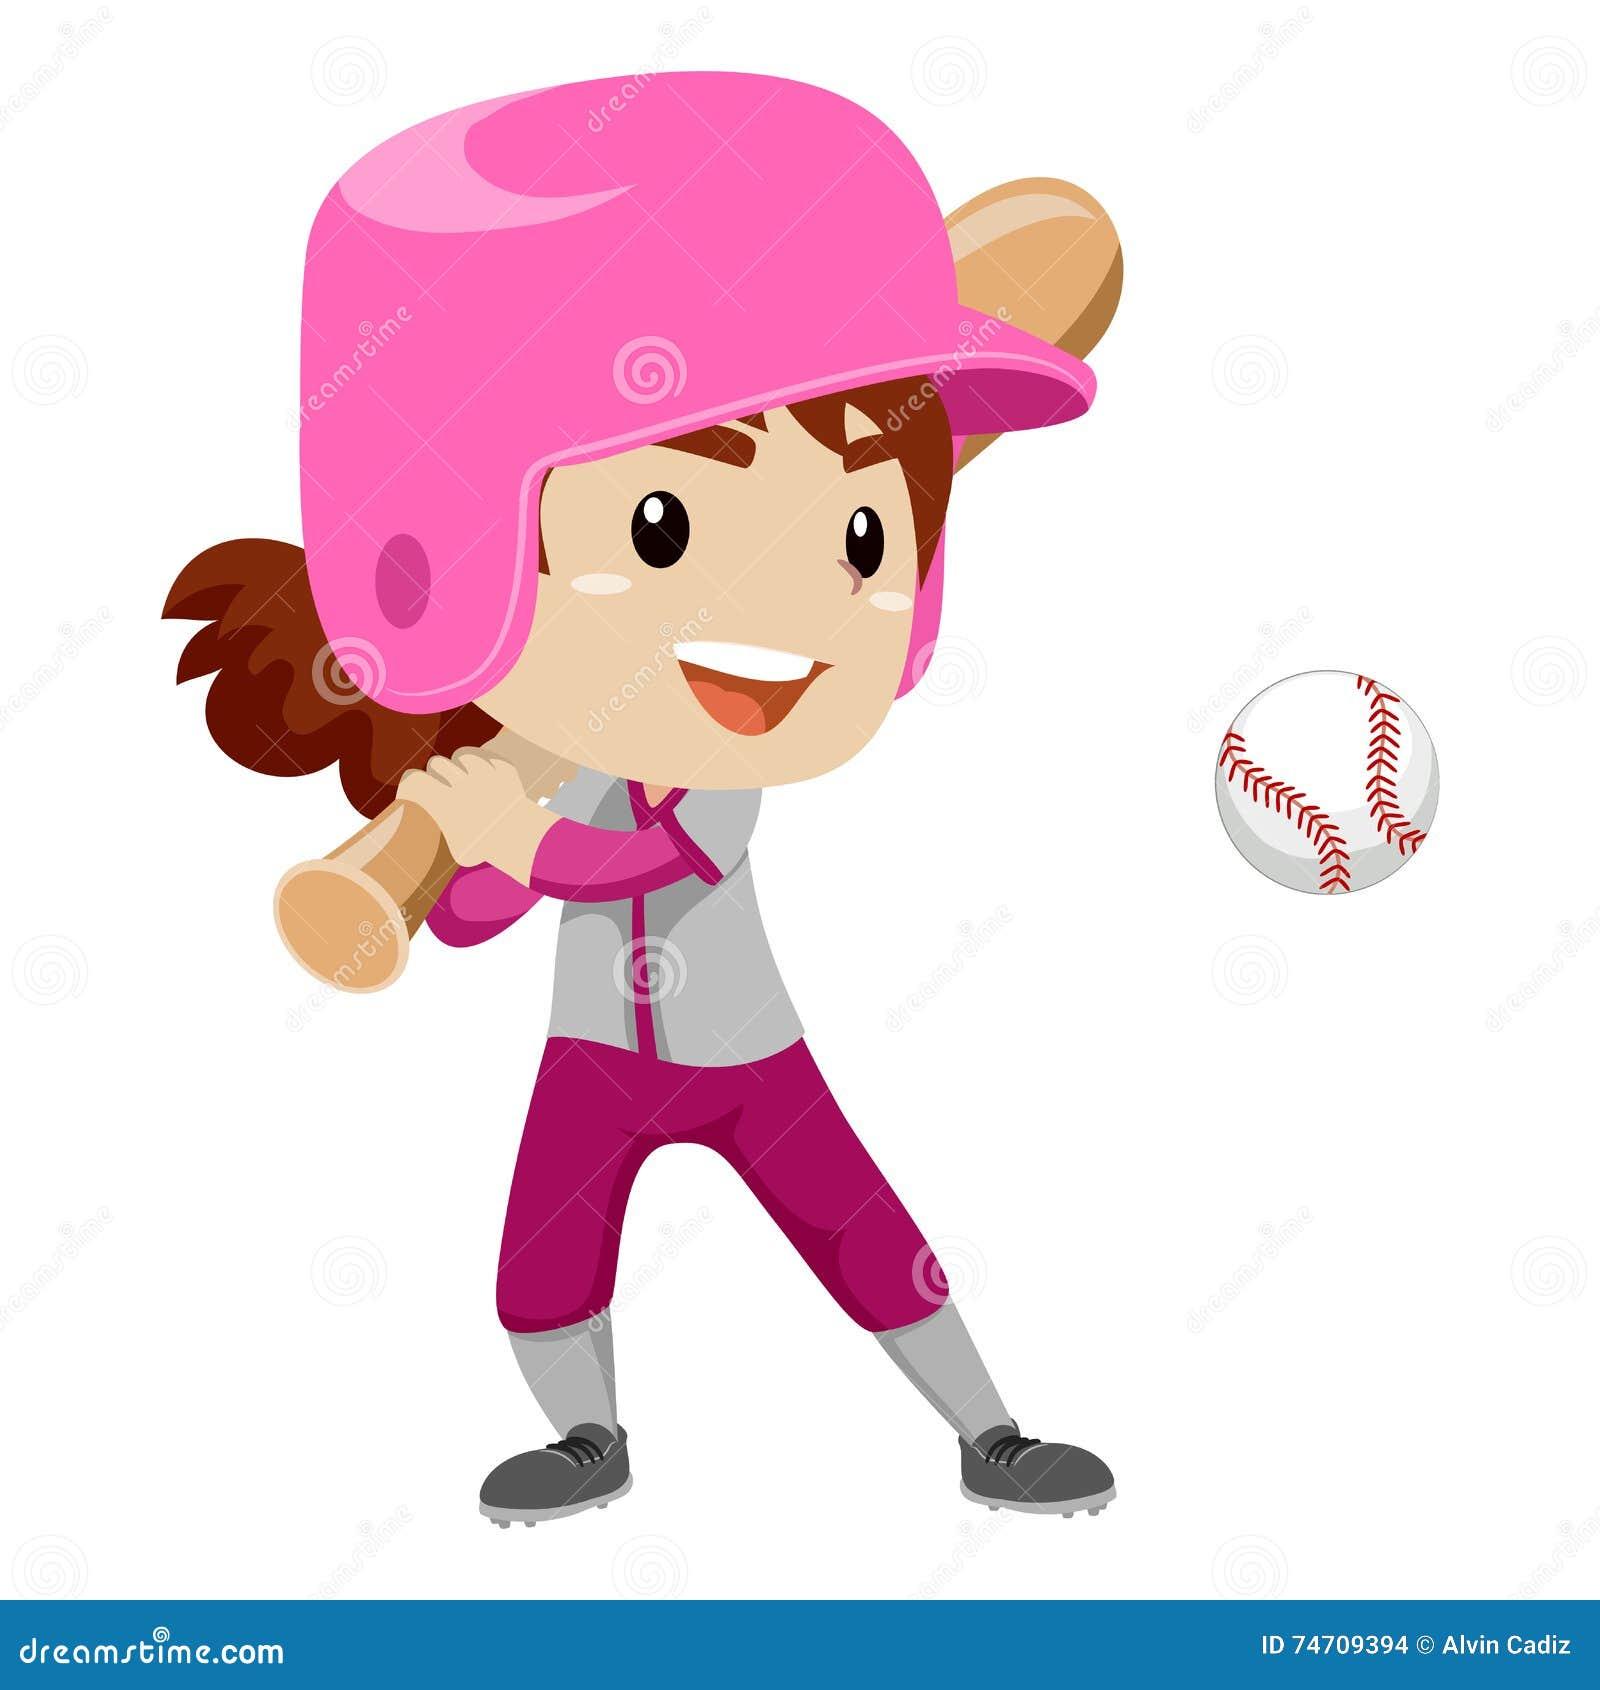 kid girl baseball player strike a ball stock vector Softball Bat Outline softball bat and ball clipart